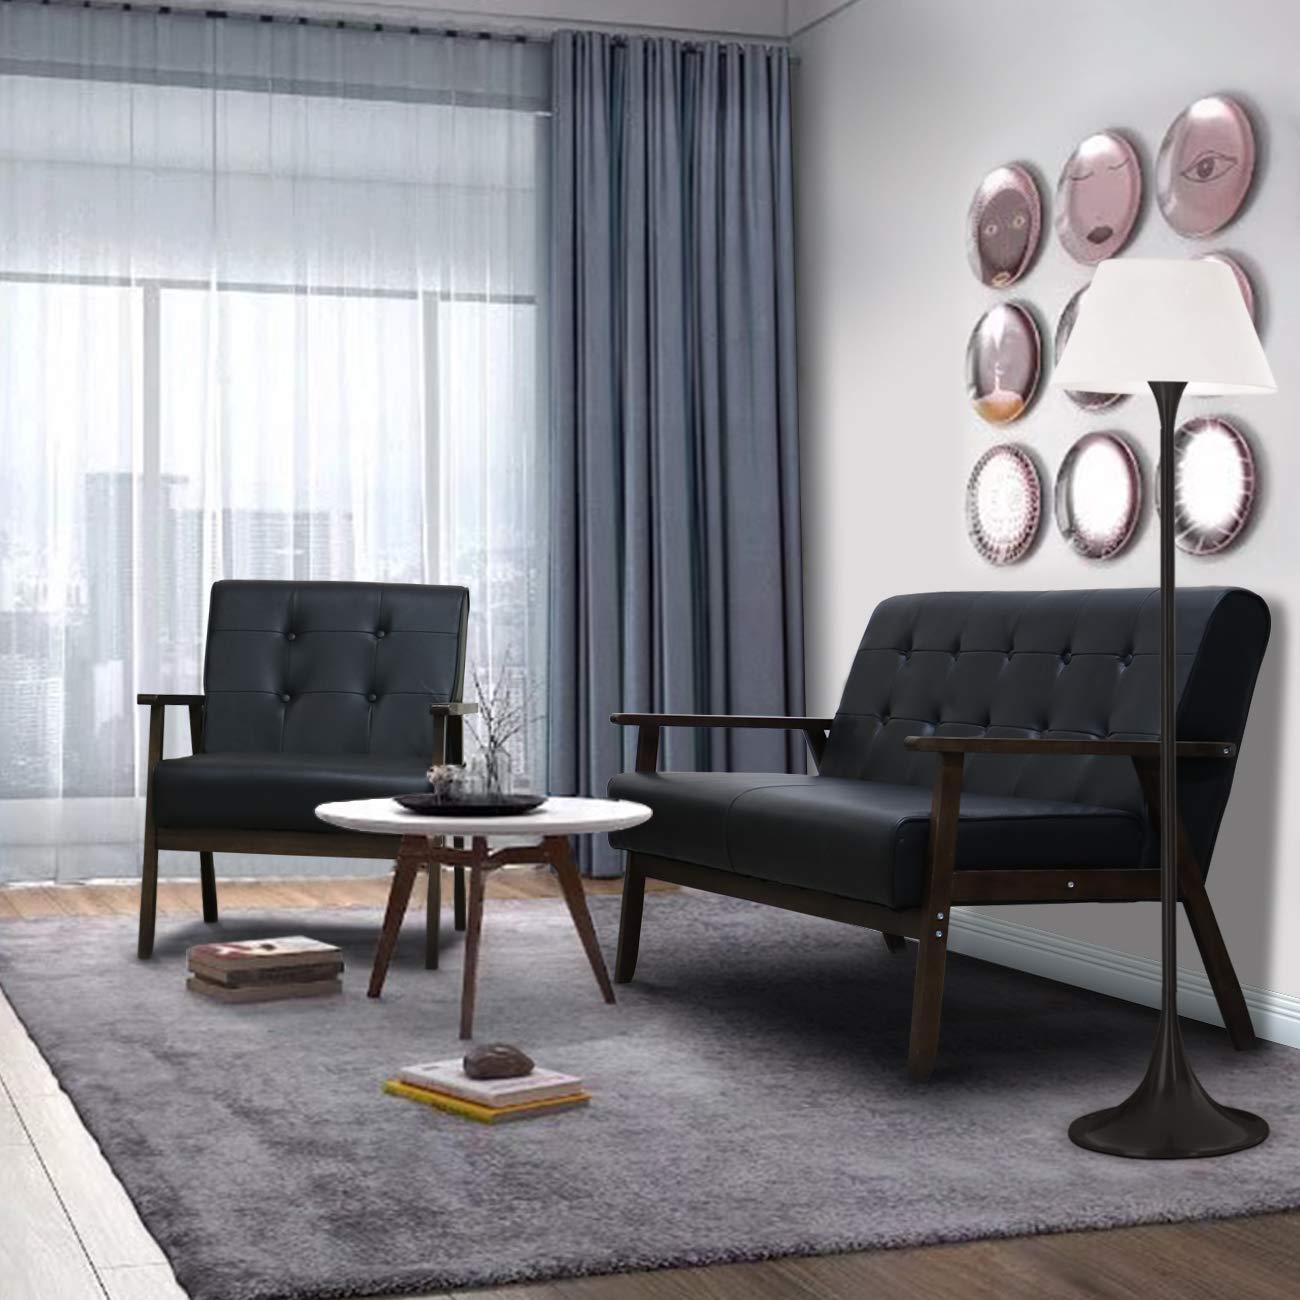 Amazing Aodailihb Modern Fabric Upholstered Wooden 2 Seat Sofa Set Sleek Minimalist Loveseat Sturdy And Durable Double Sofa Black Set Andrewgaddart Wooden Chair Designs For Living Room Andrewgaddartcom